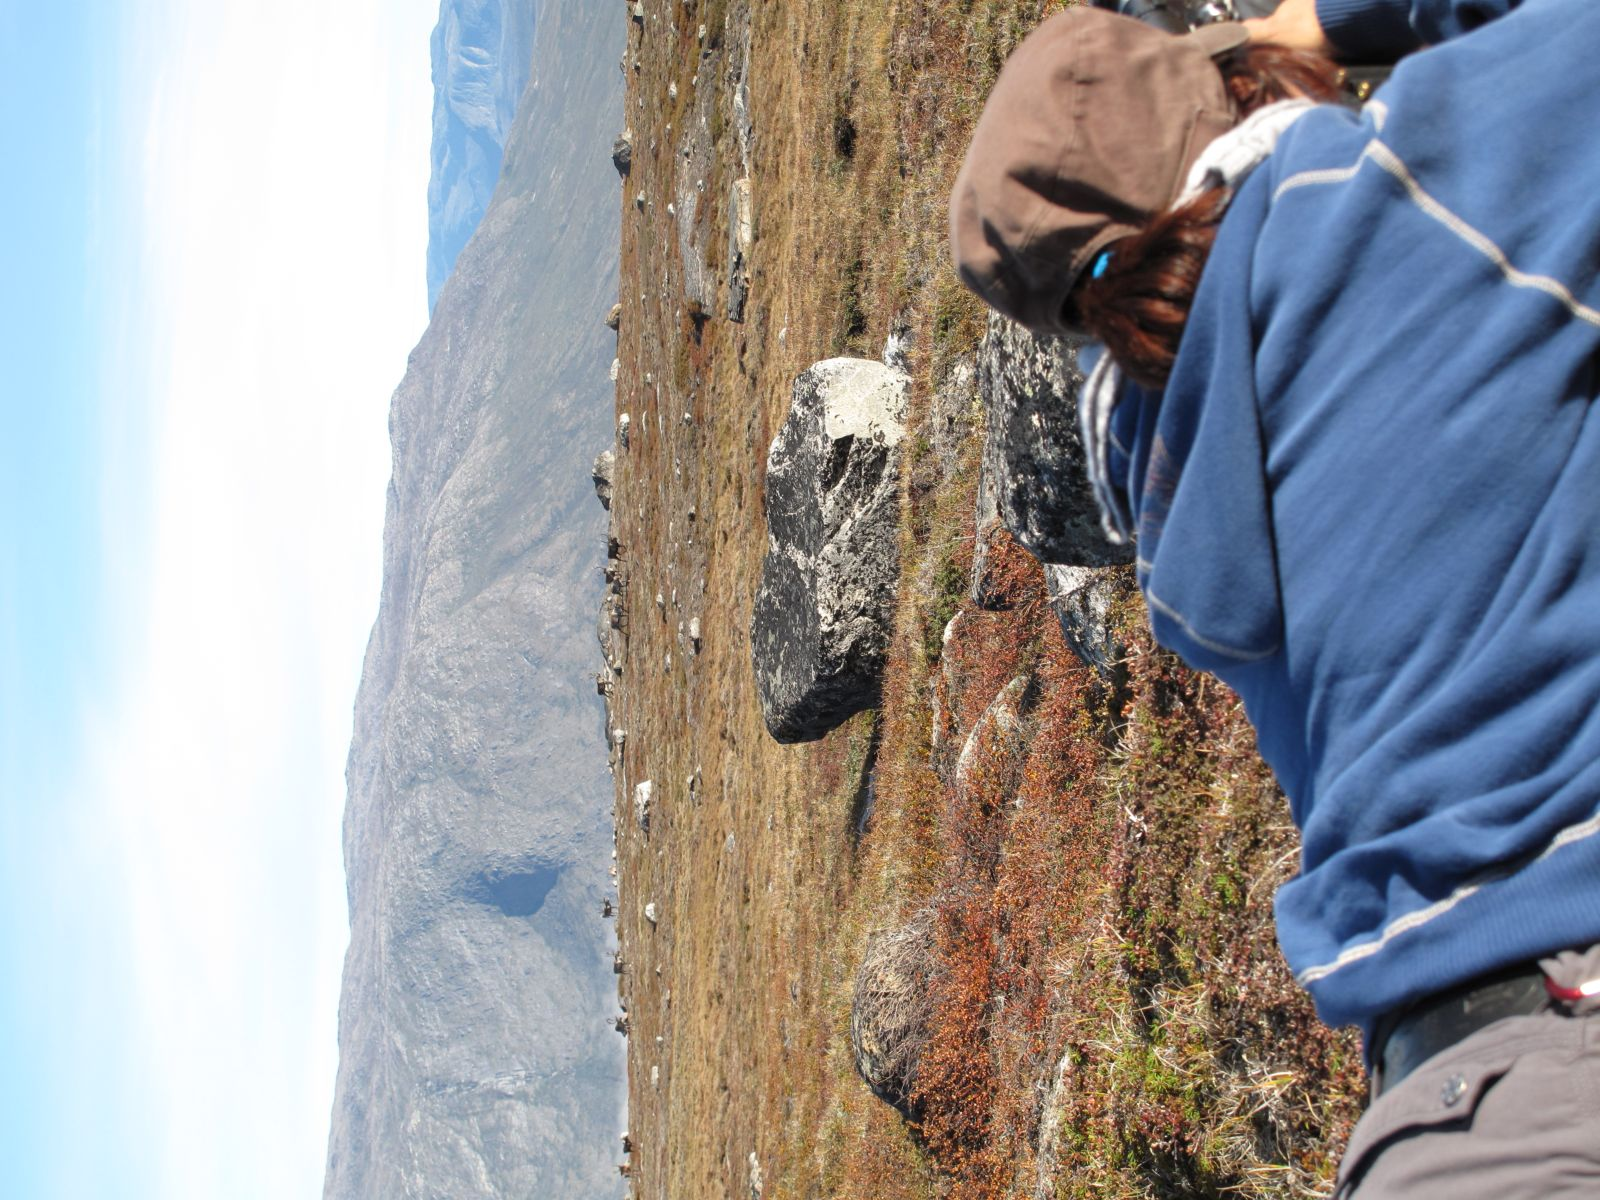 2010-09-04-1158_-_Nuka Klausen Telling; Rensdyr